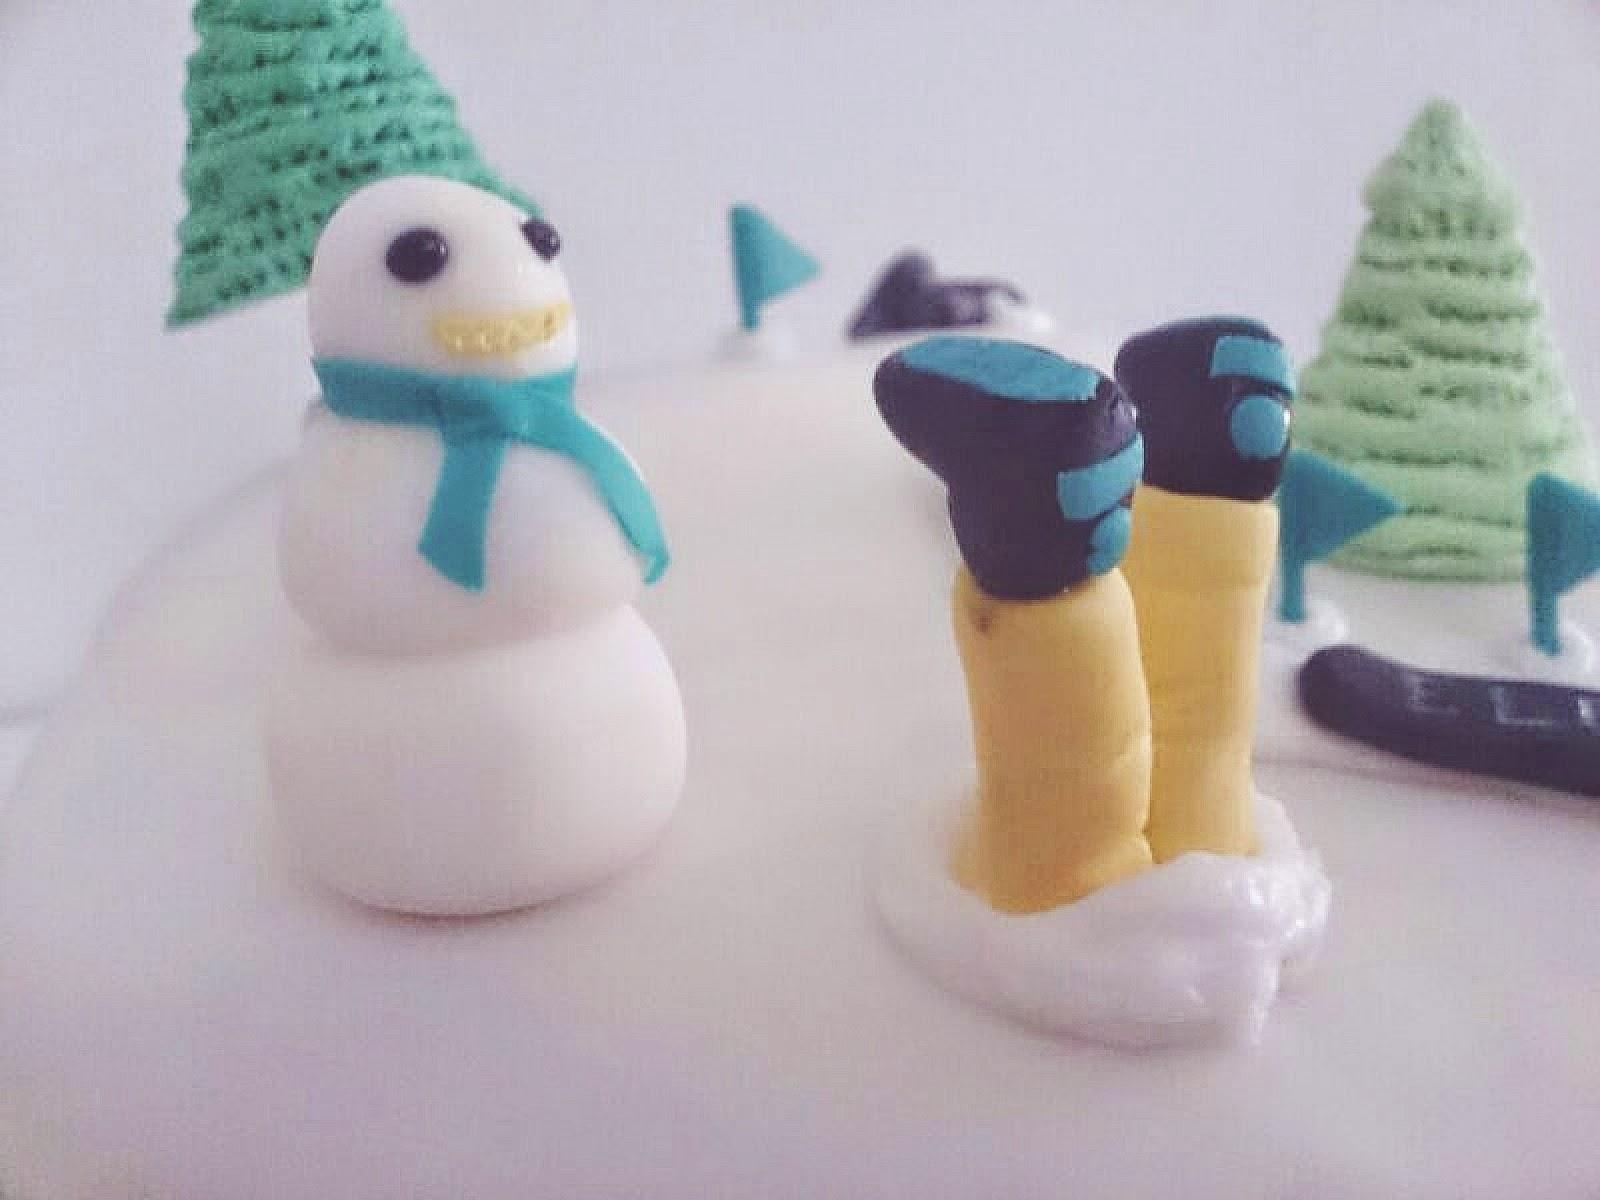 tartas, fondant, tutoriales, muñeco de nieve fondant, tartas fondant